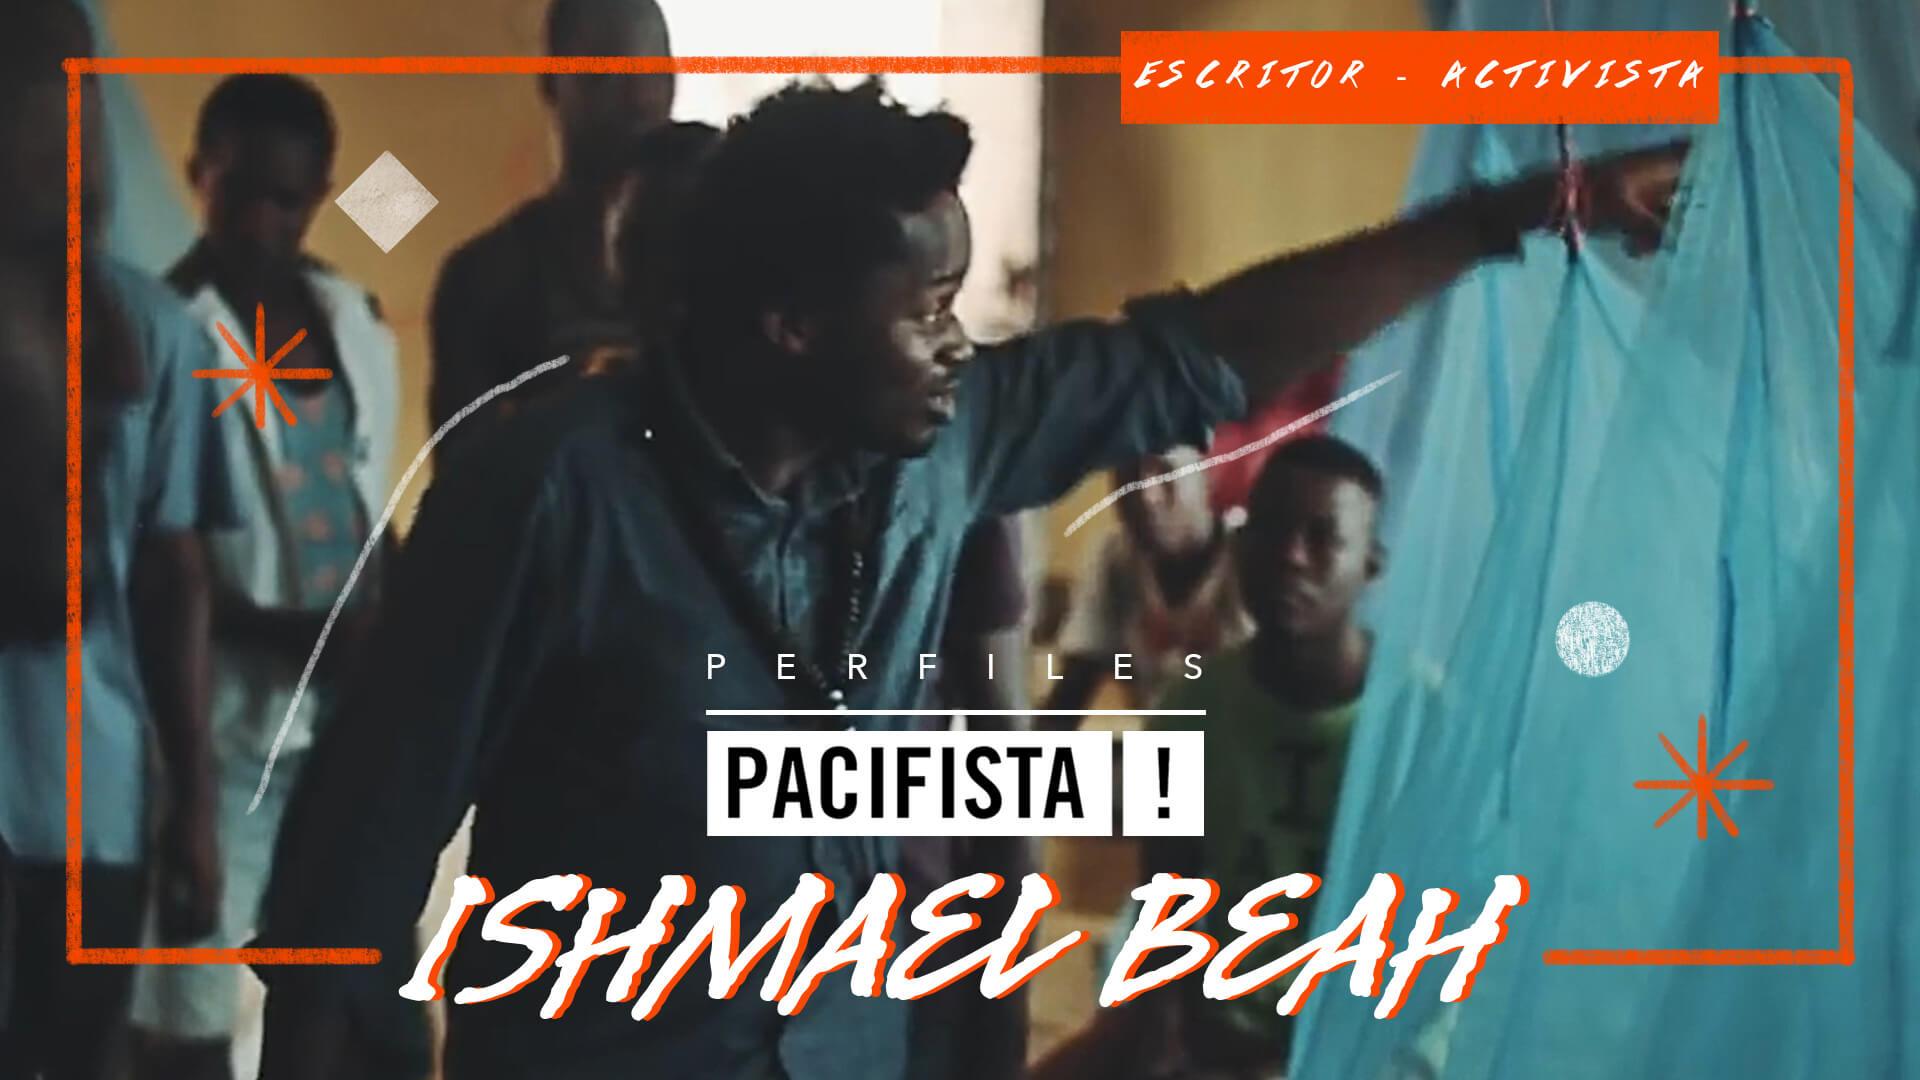 Ishmael Beah, literatura africana contra la guerra | Perfiles Pacifista!